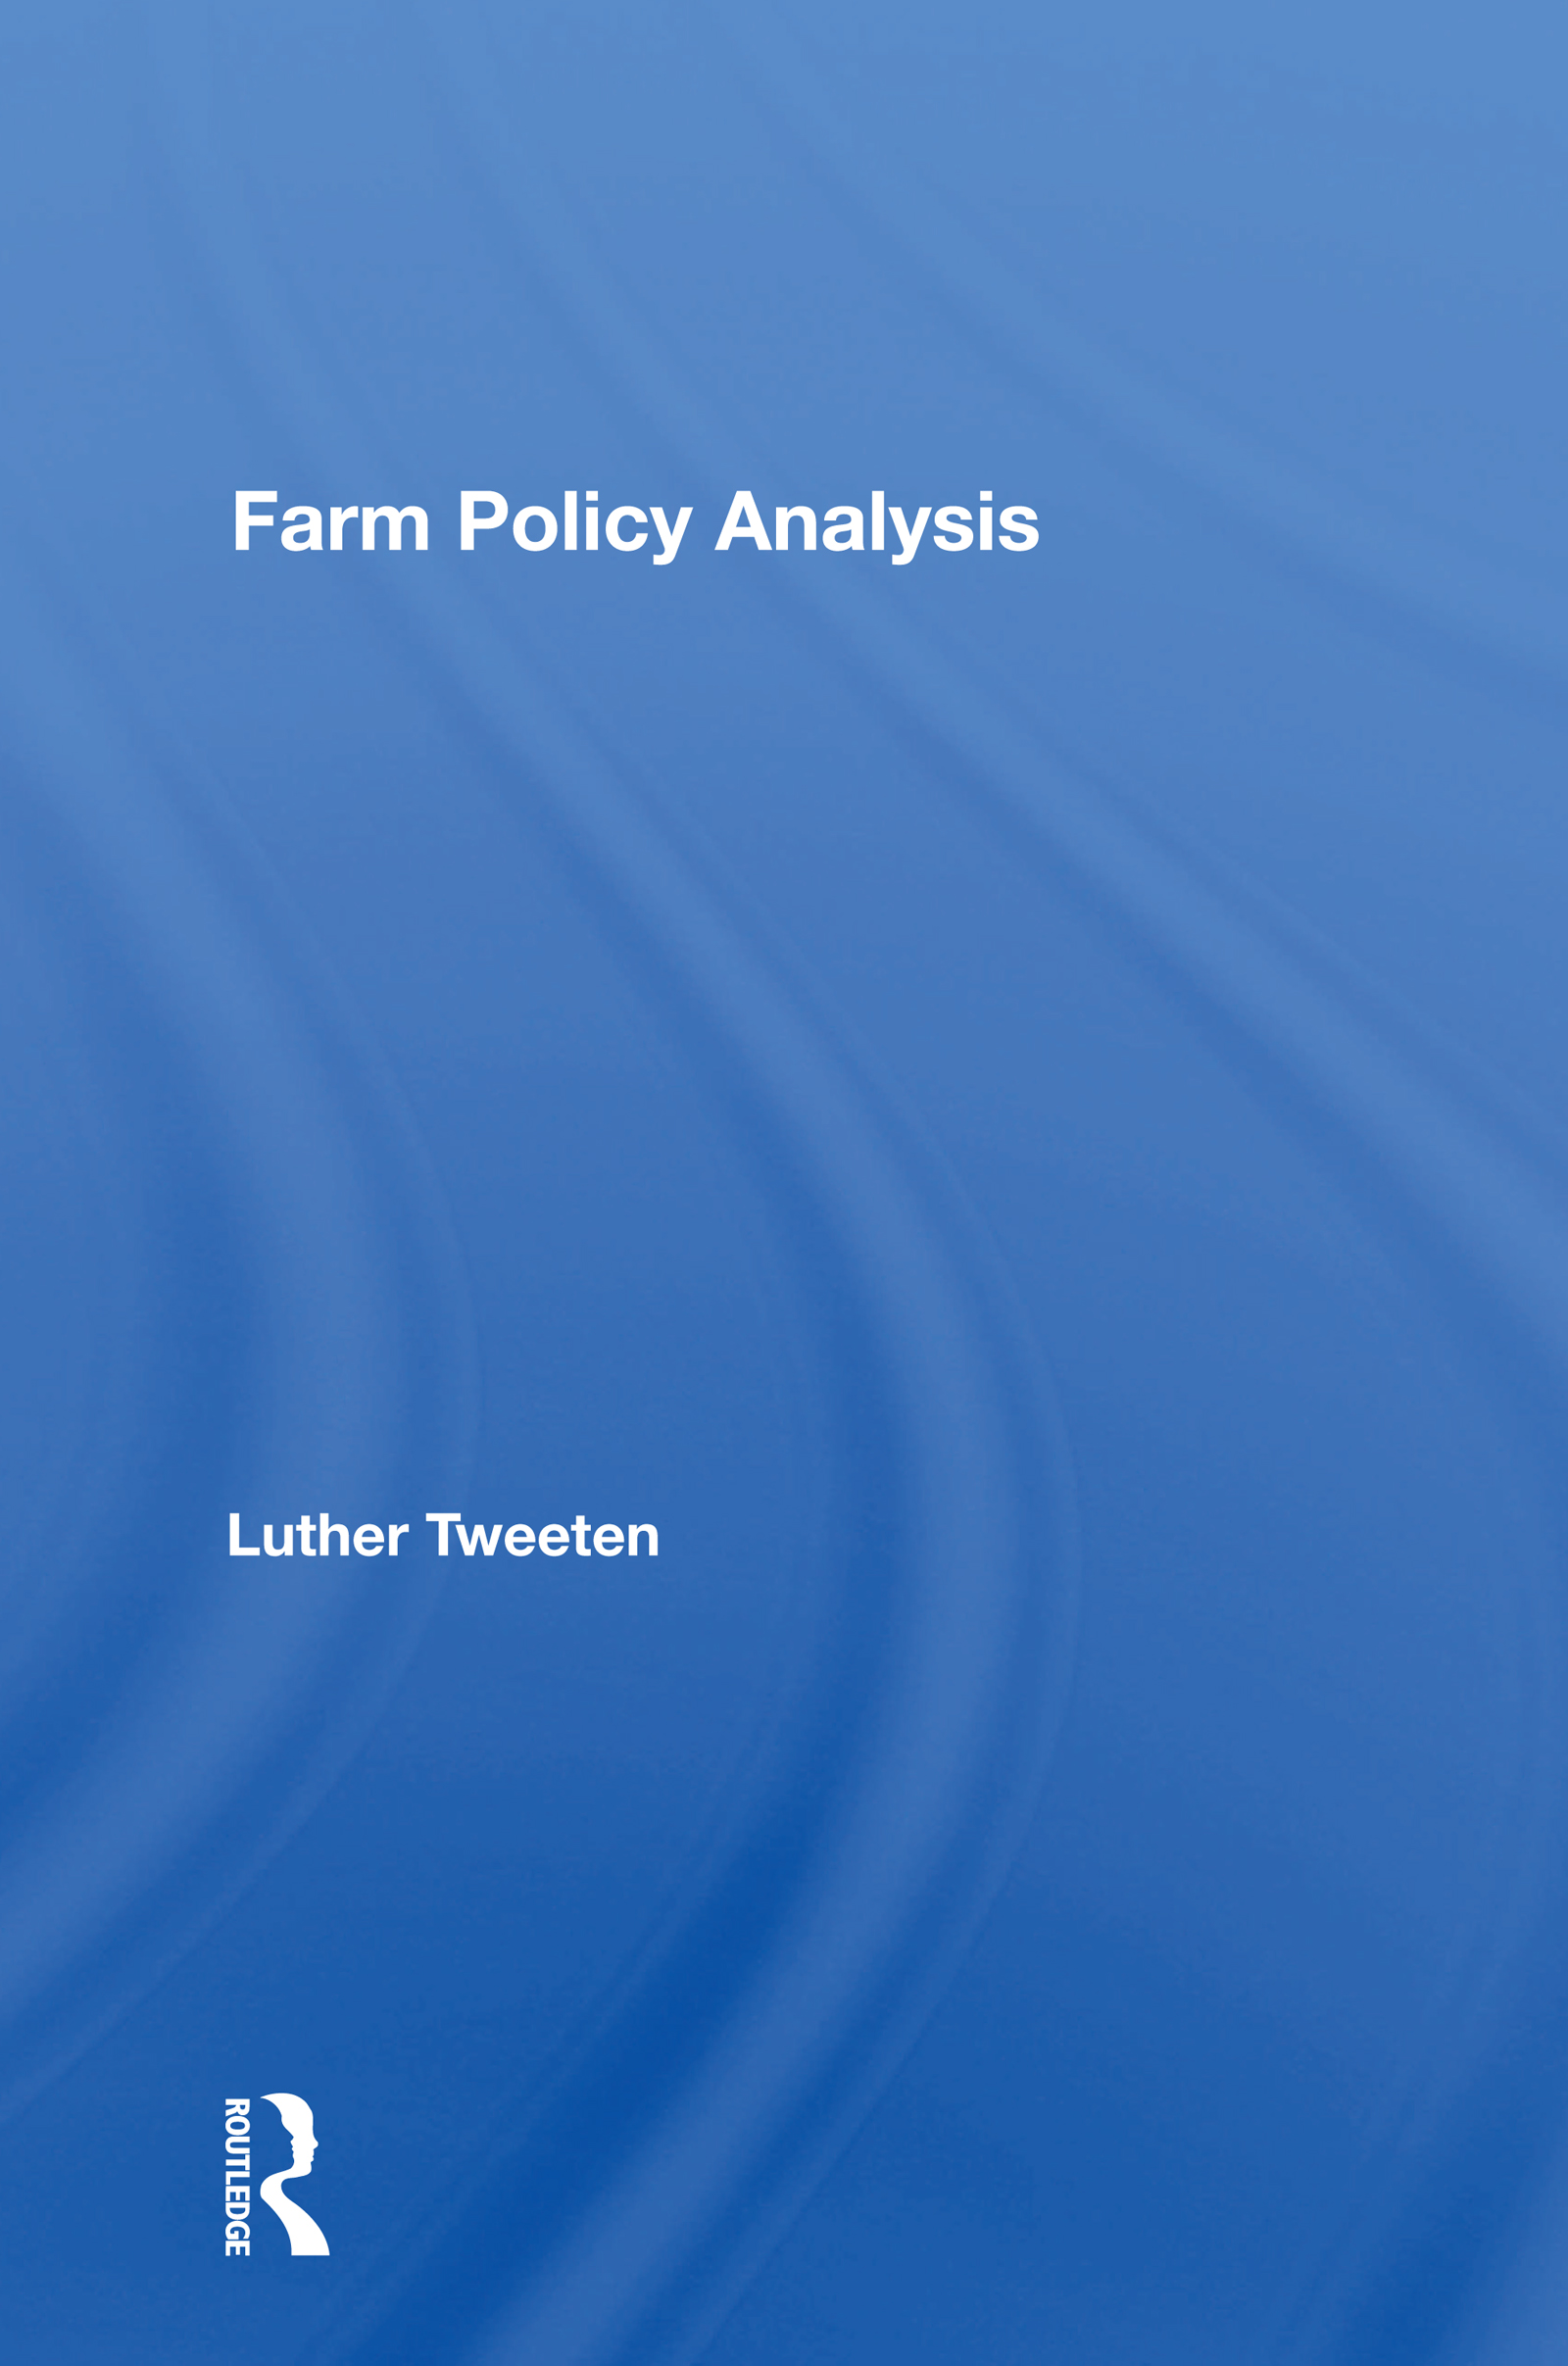 Farm Policy Analysis